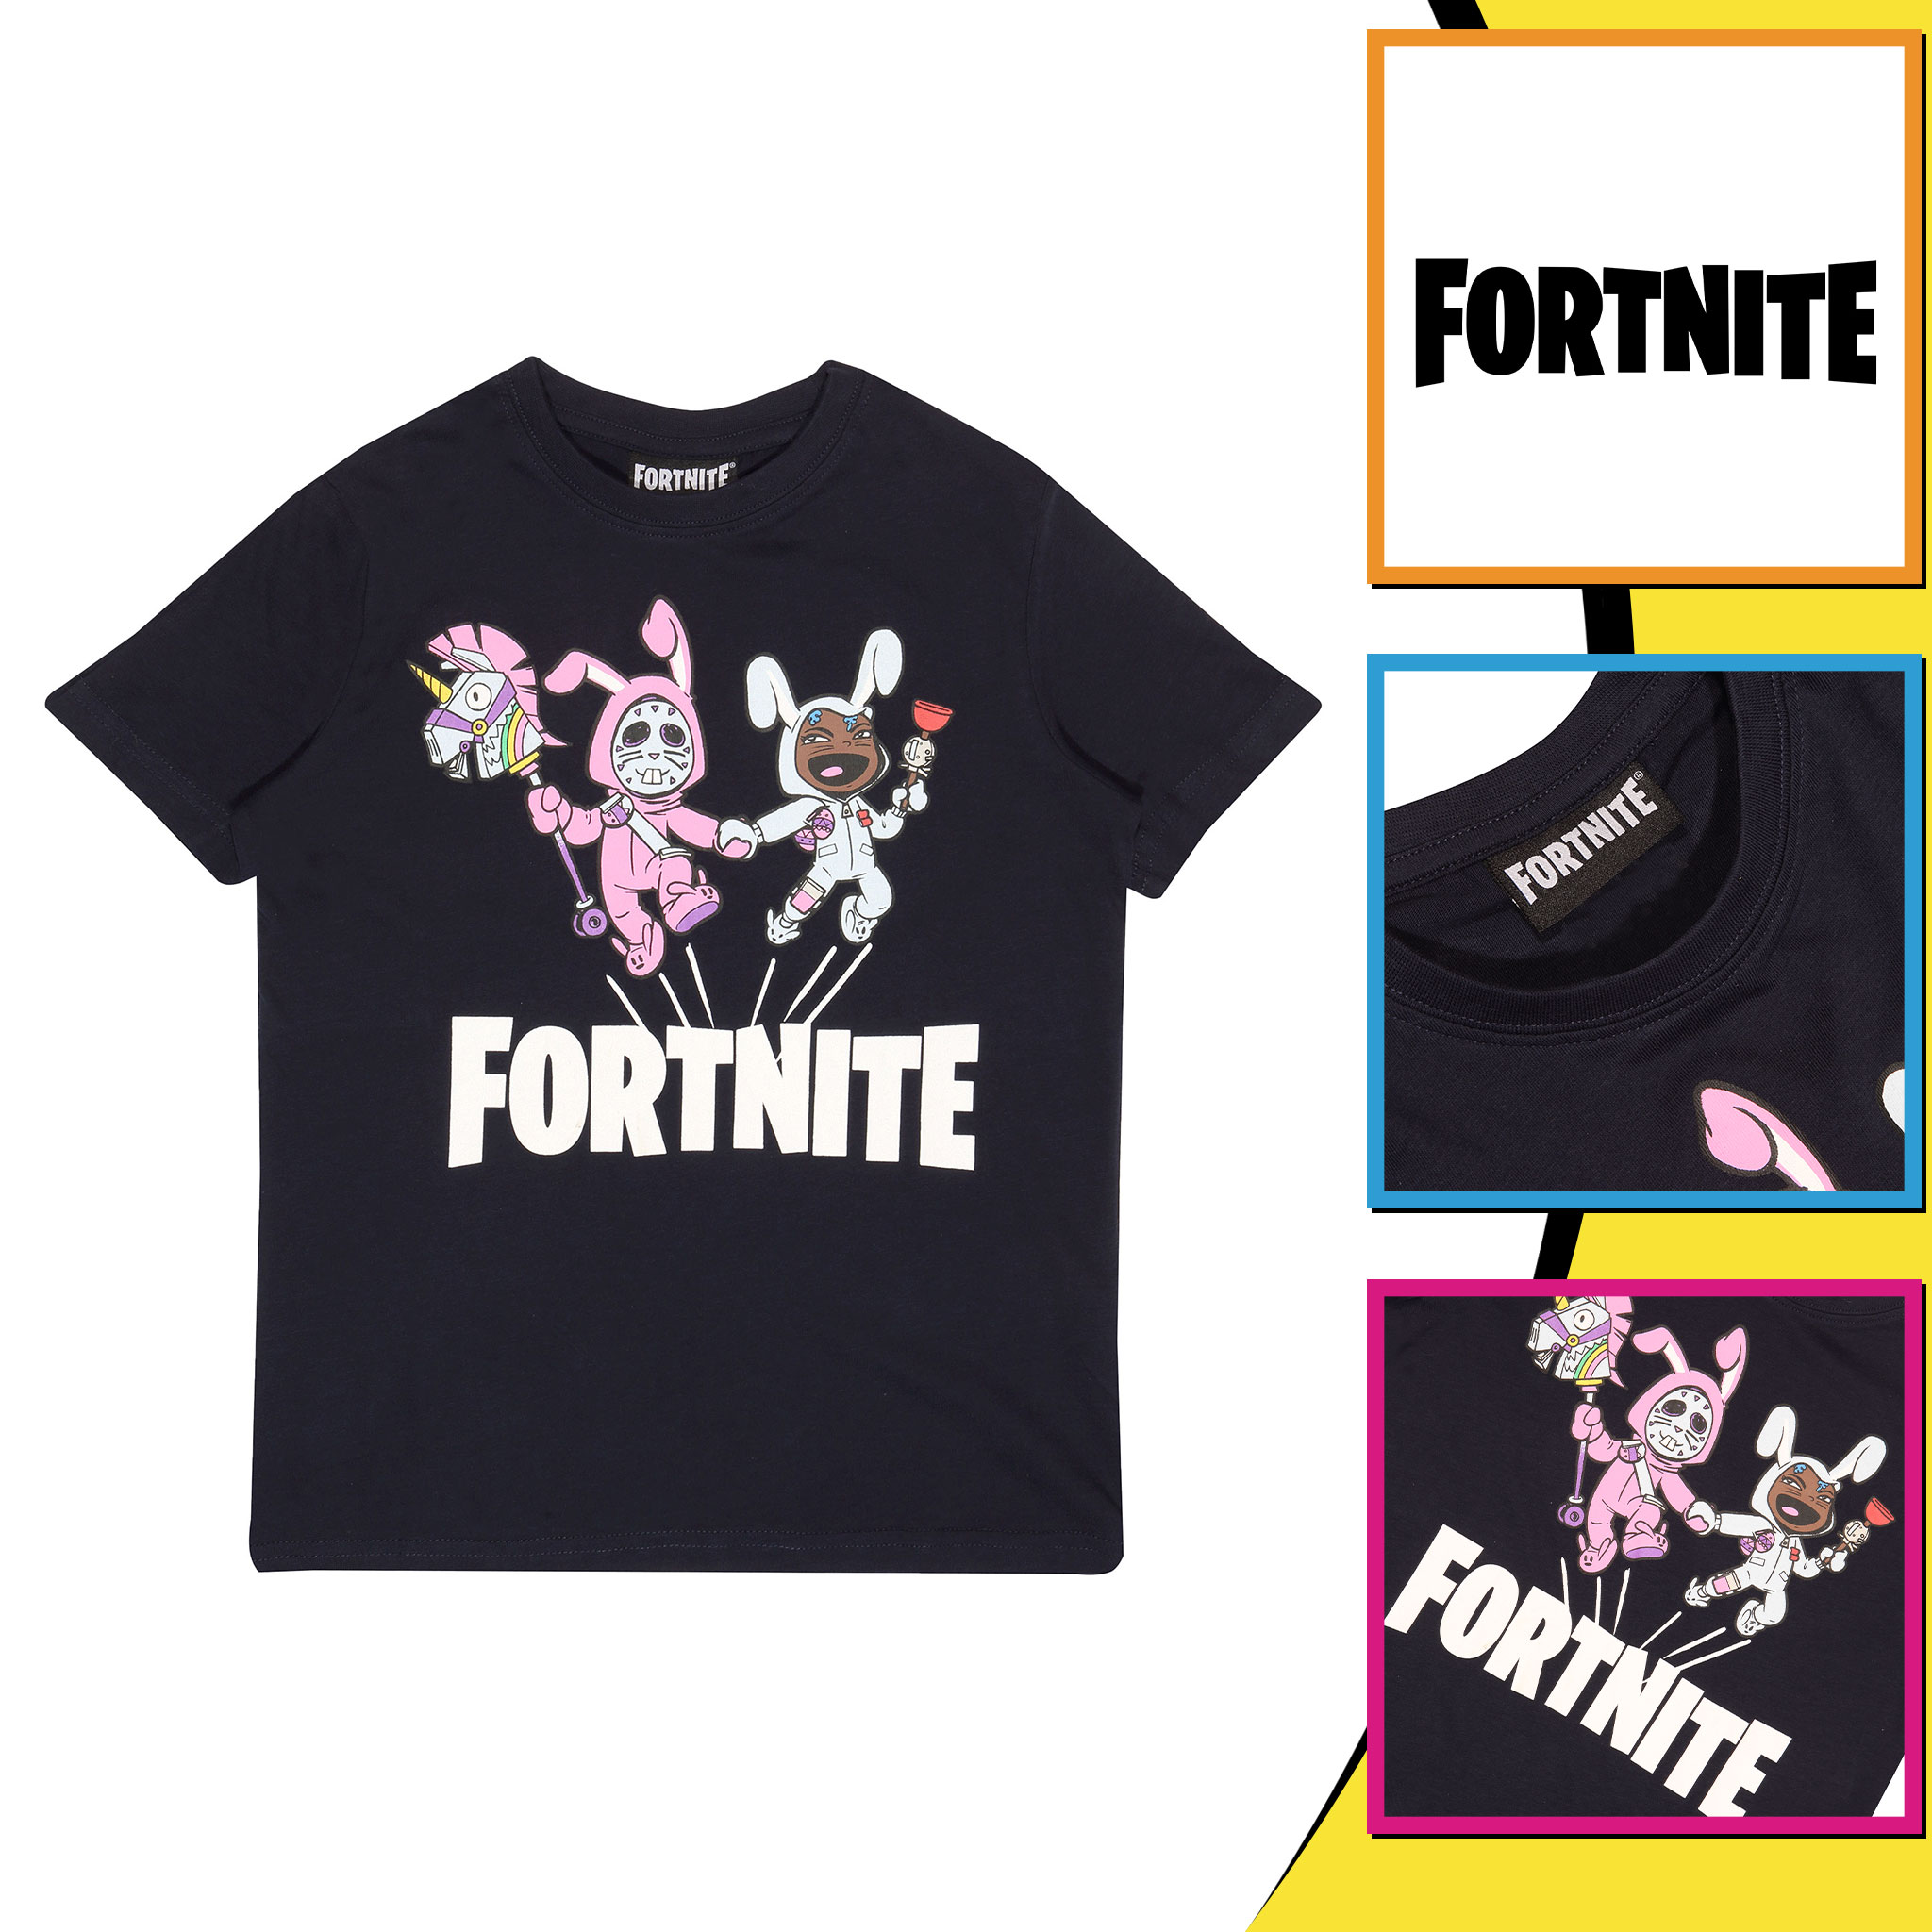 miniature 16 - Boys Fortnite T Shirt Bunny Trouble Official Merchandise